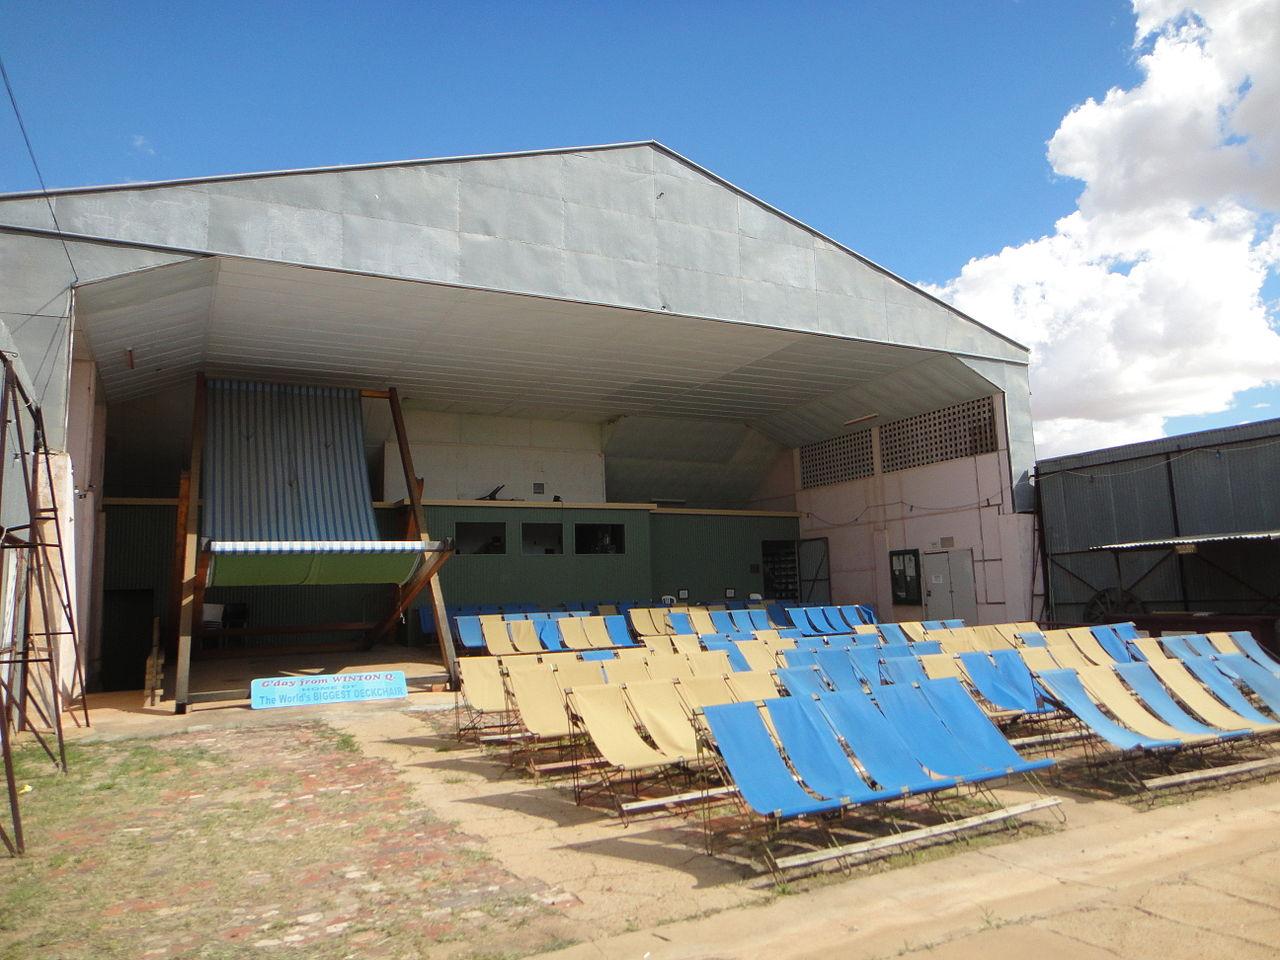 File:Winton Open Air Theatre Museum, The World's Biggest ...